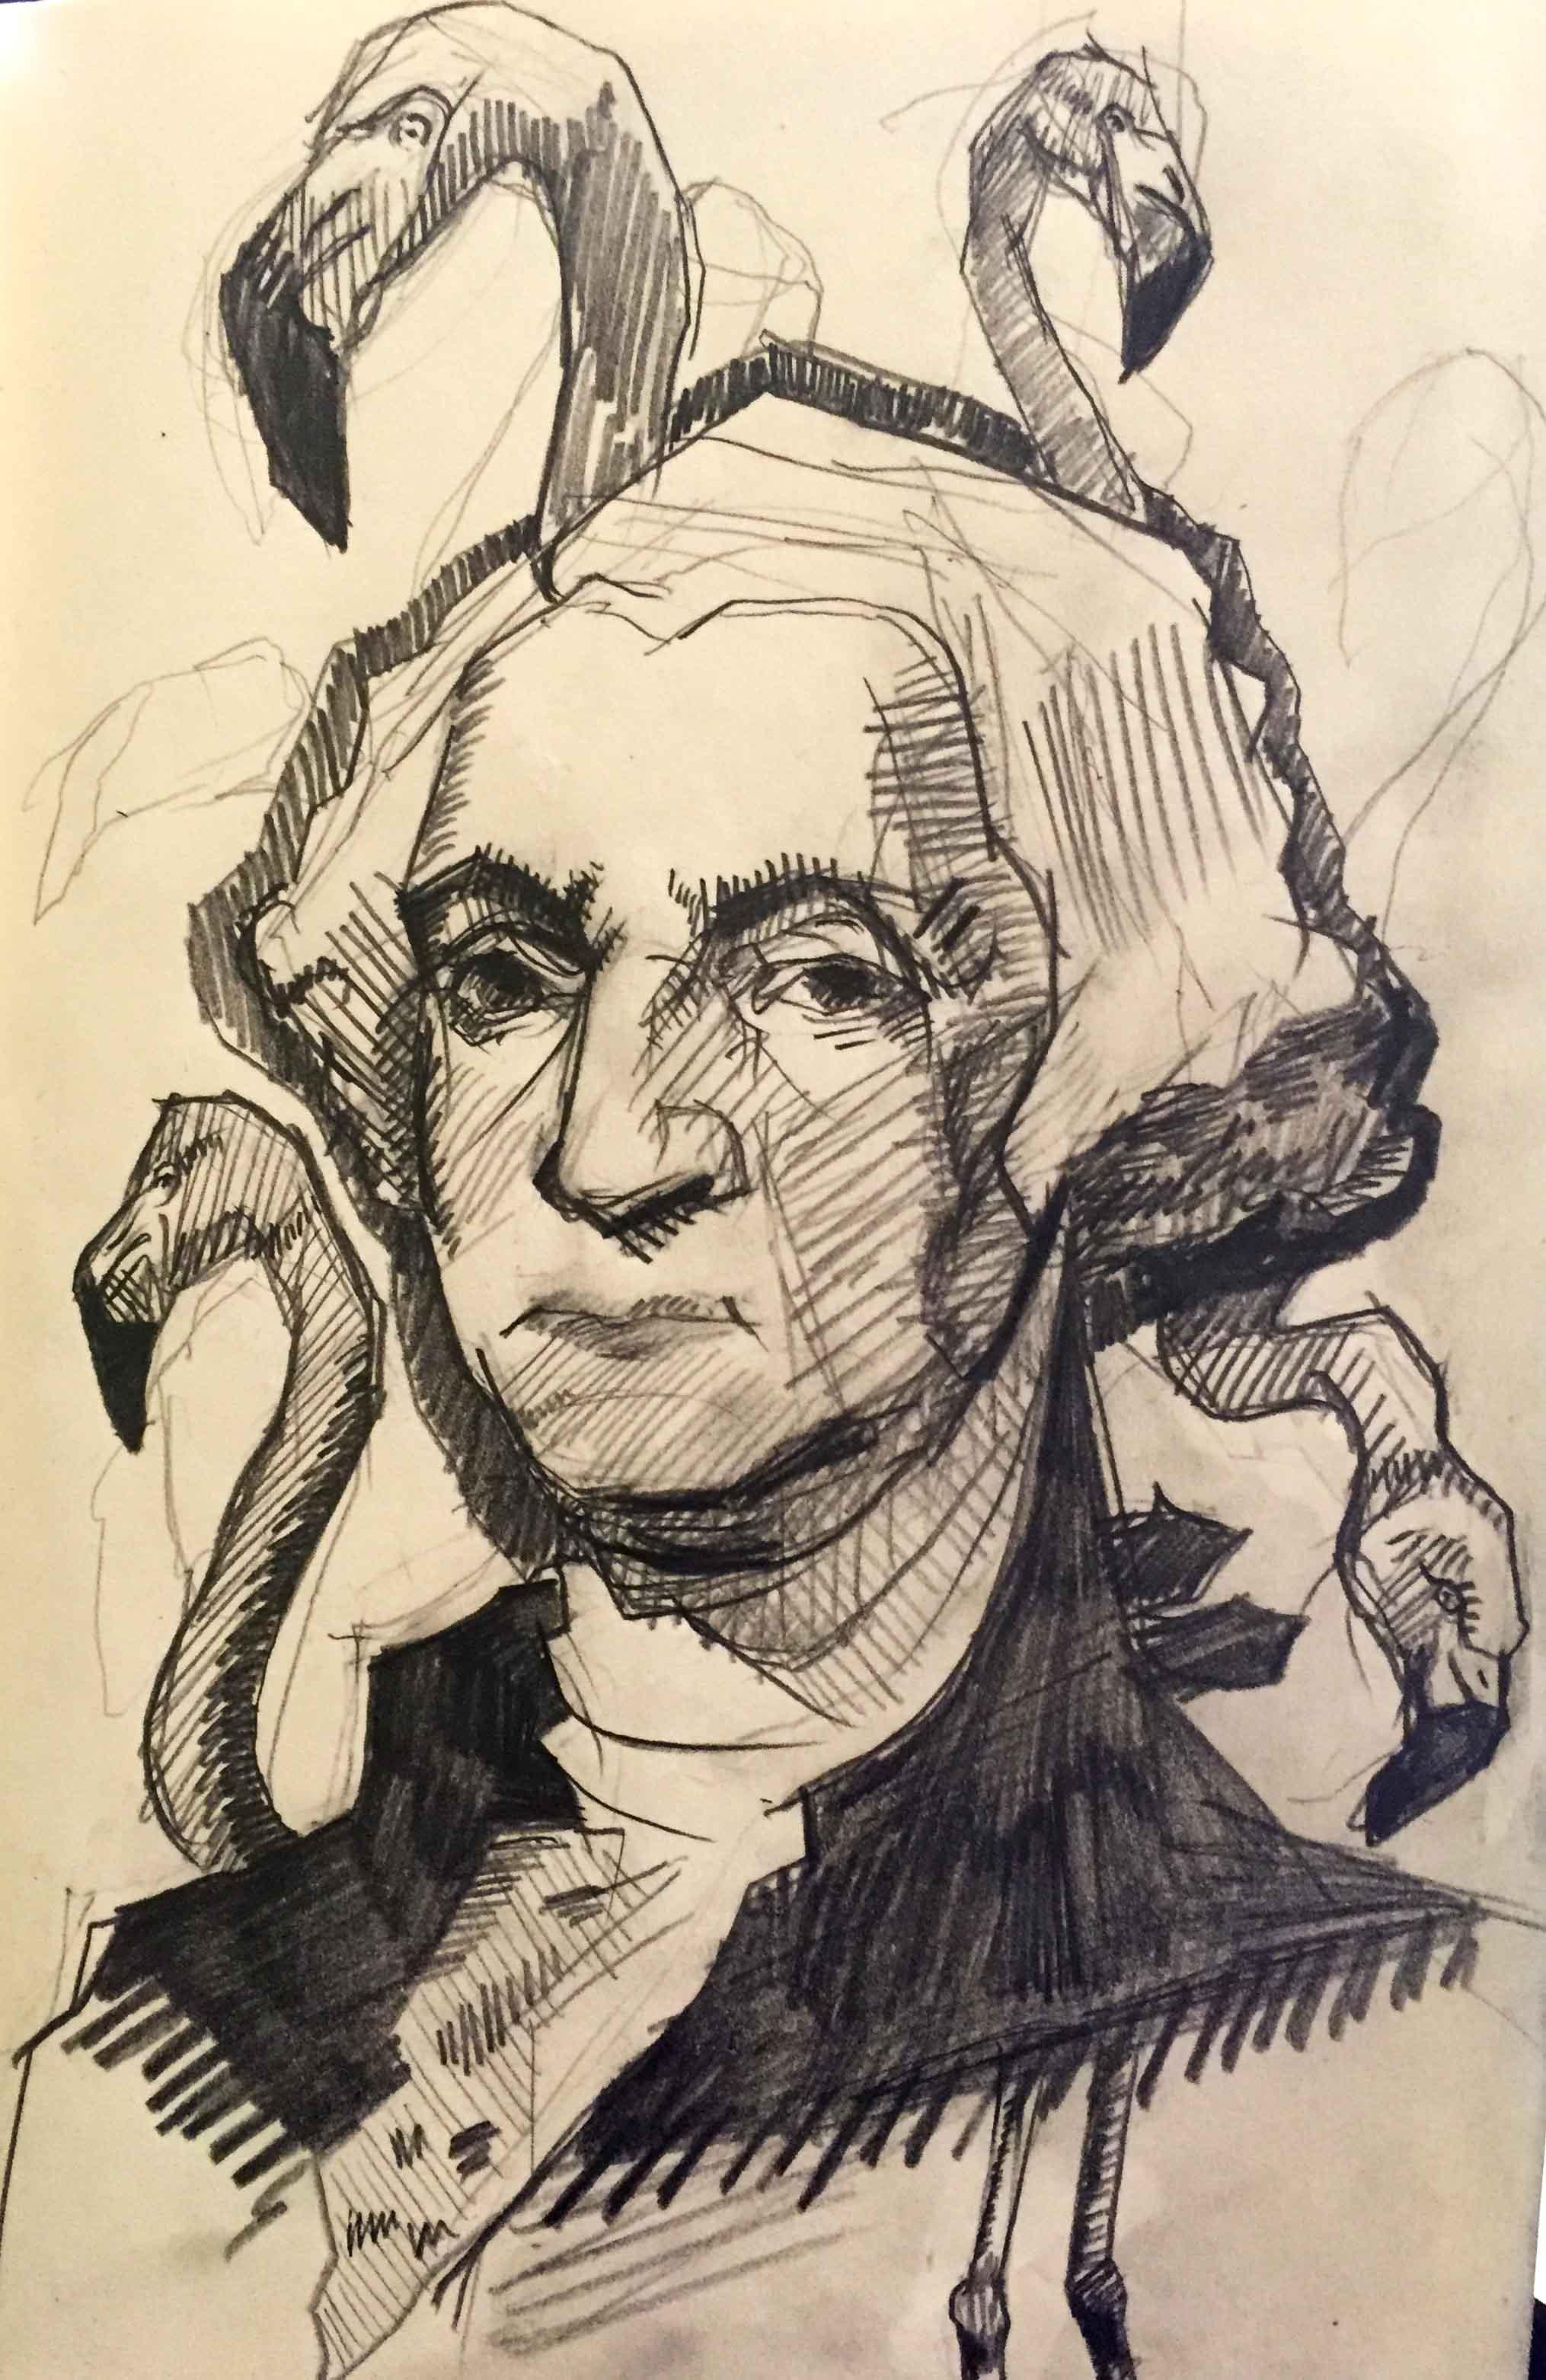 Revolutionary, 2016, pencil sketchbook work